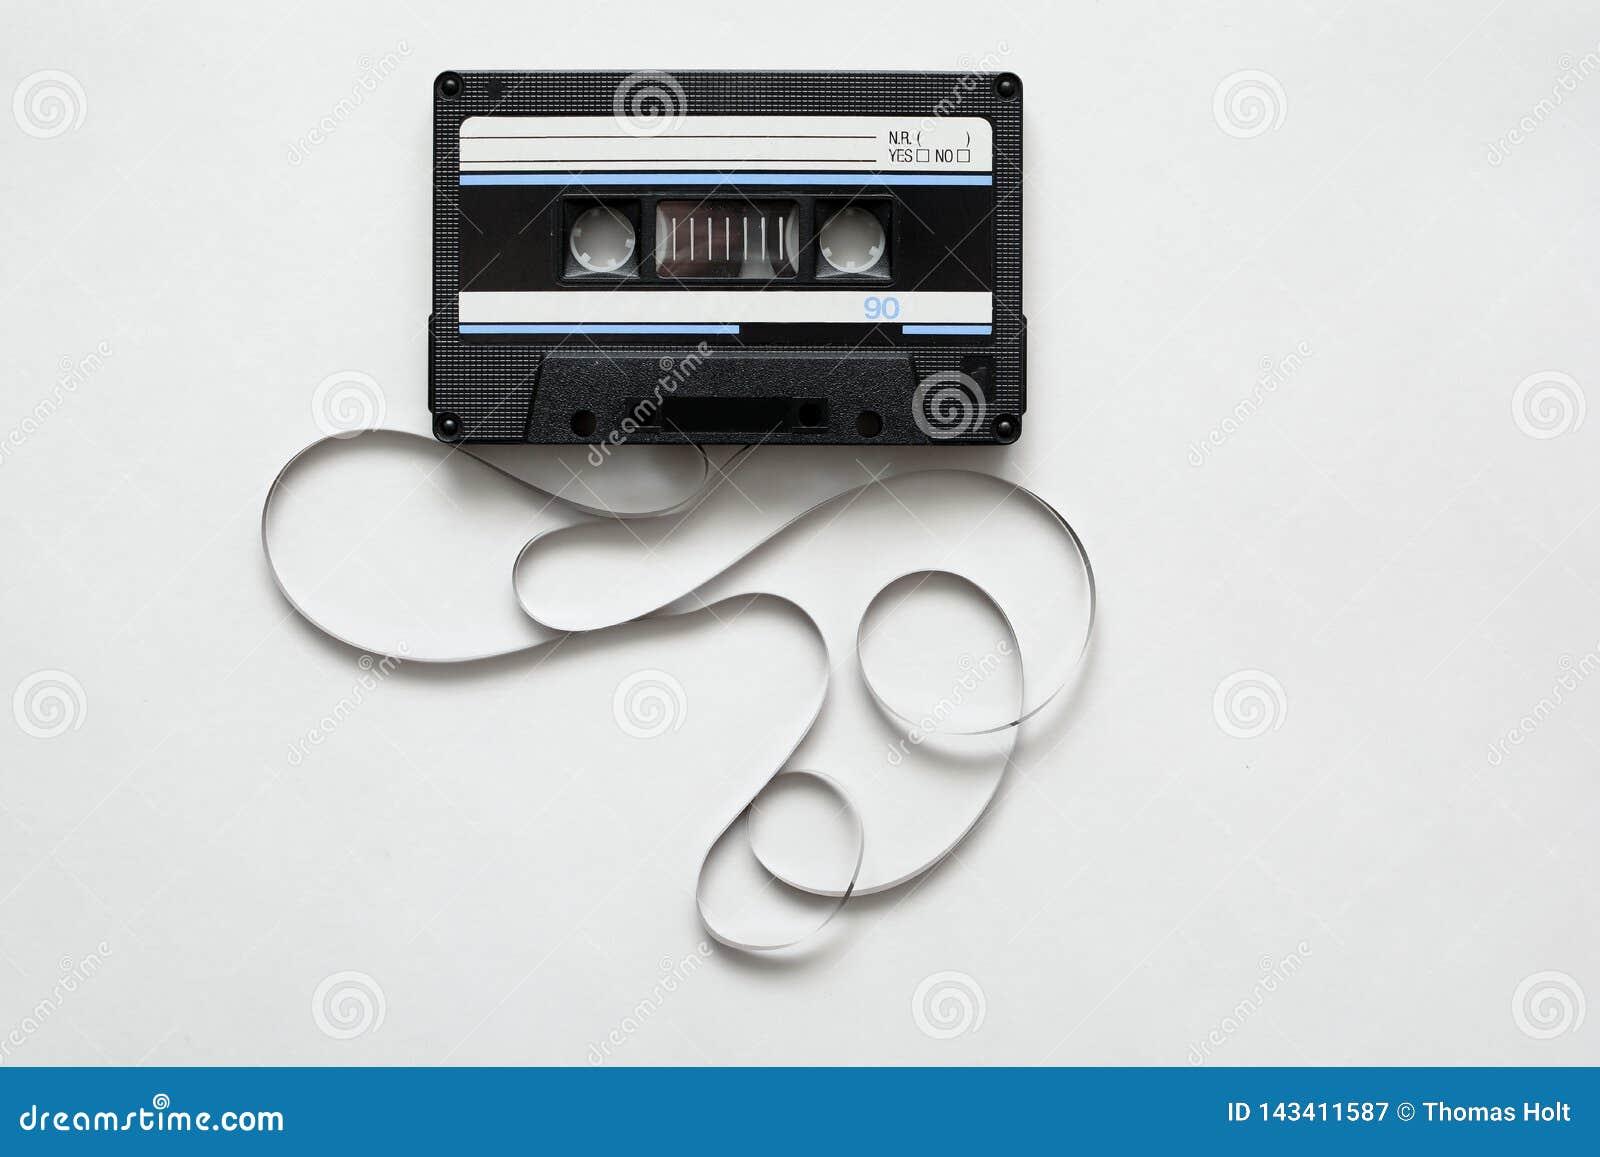 Cassette tape, retro audio cassette